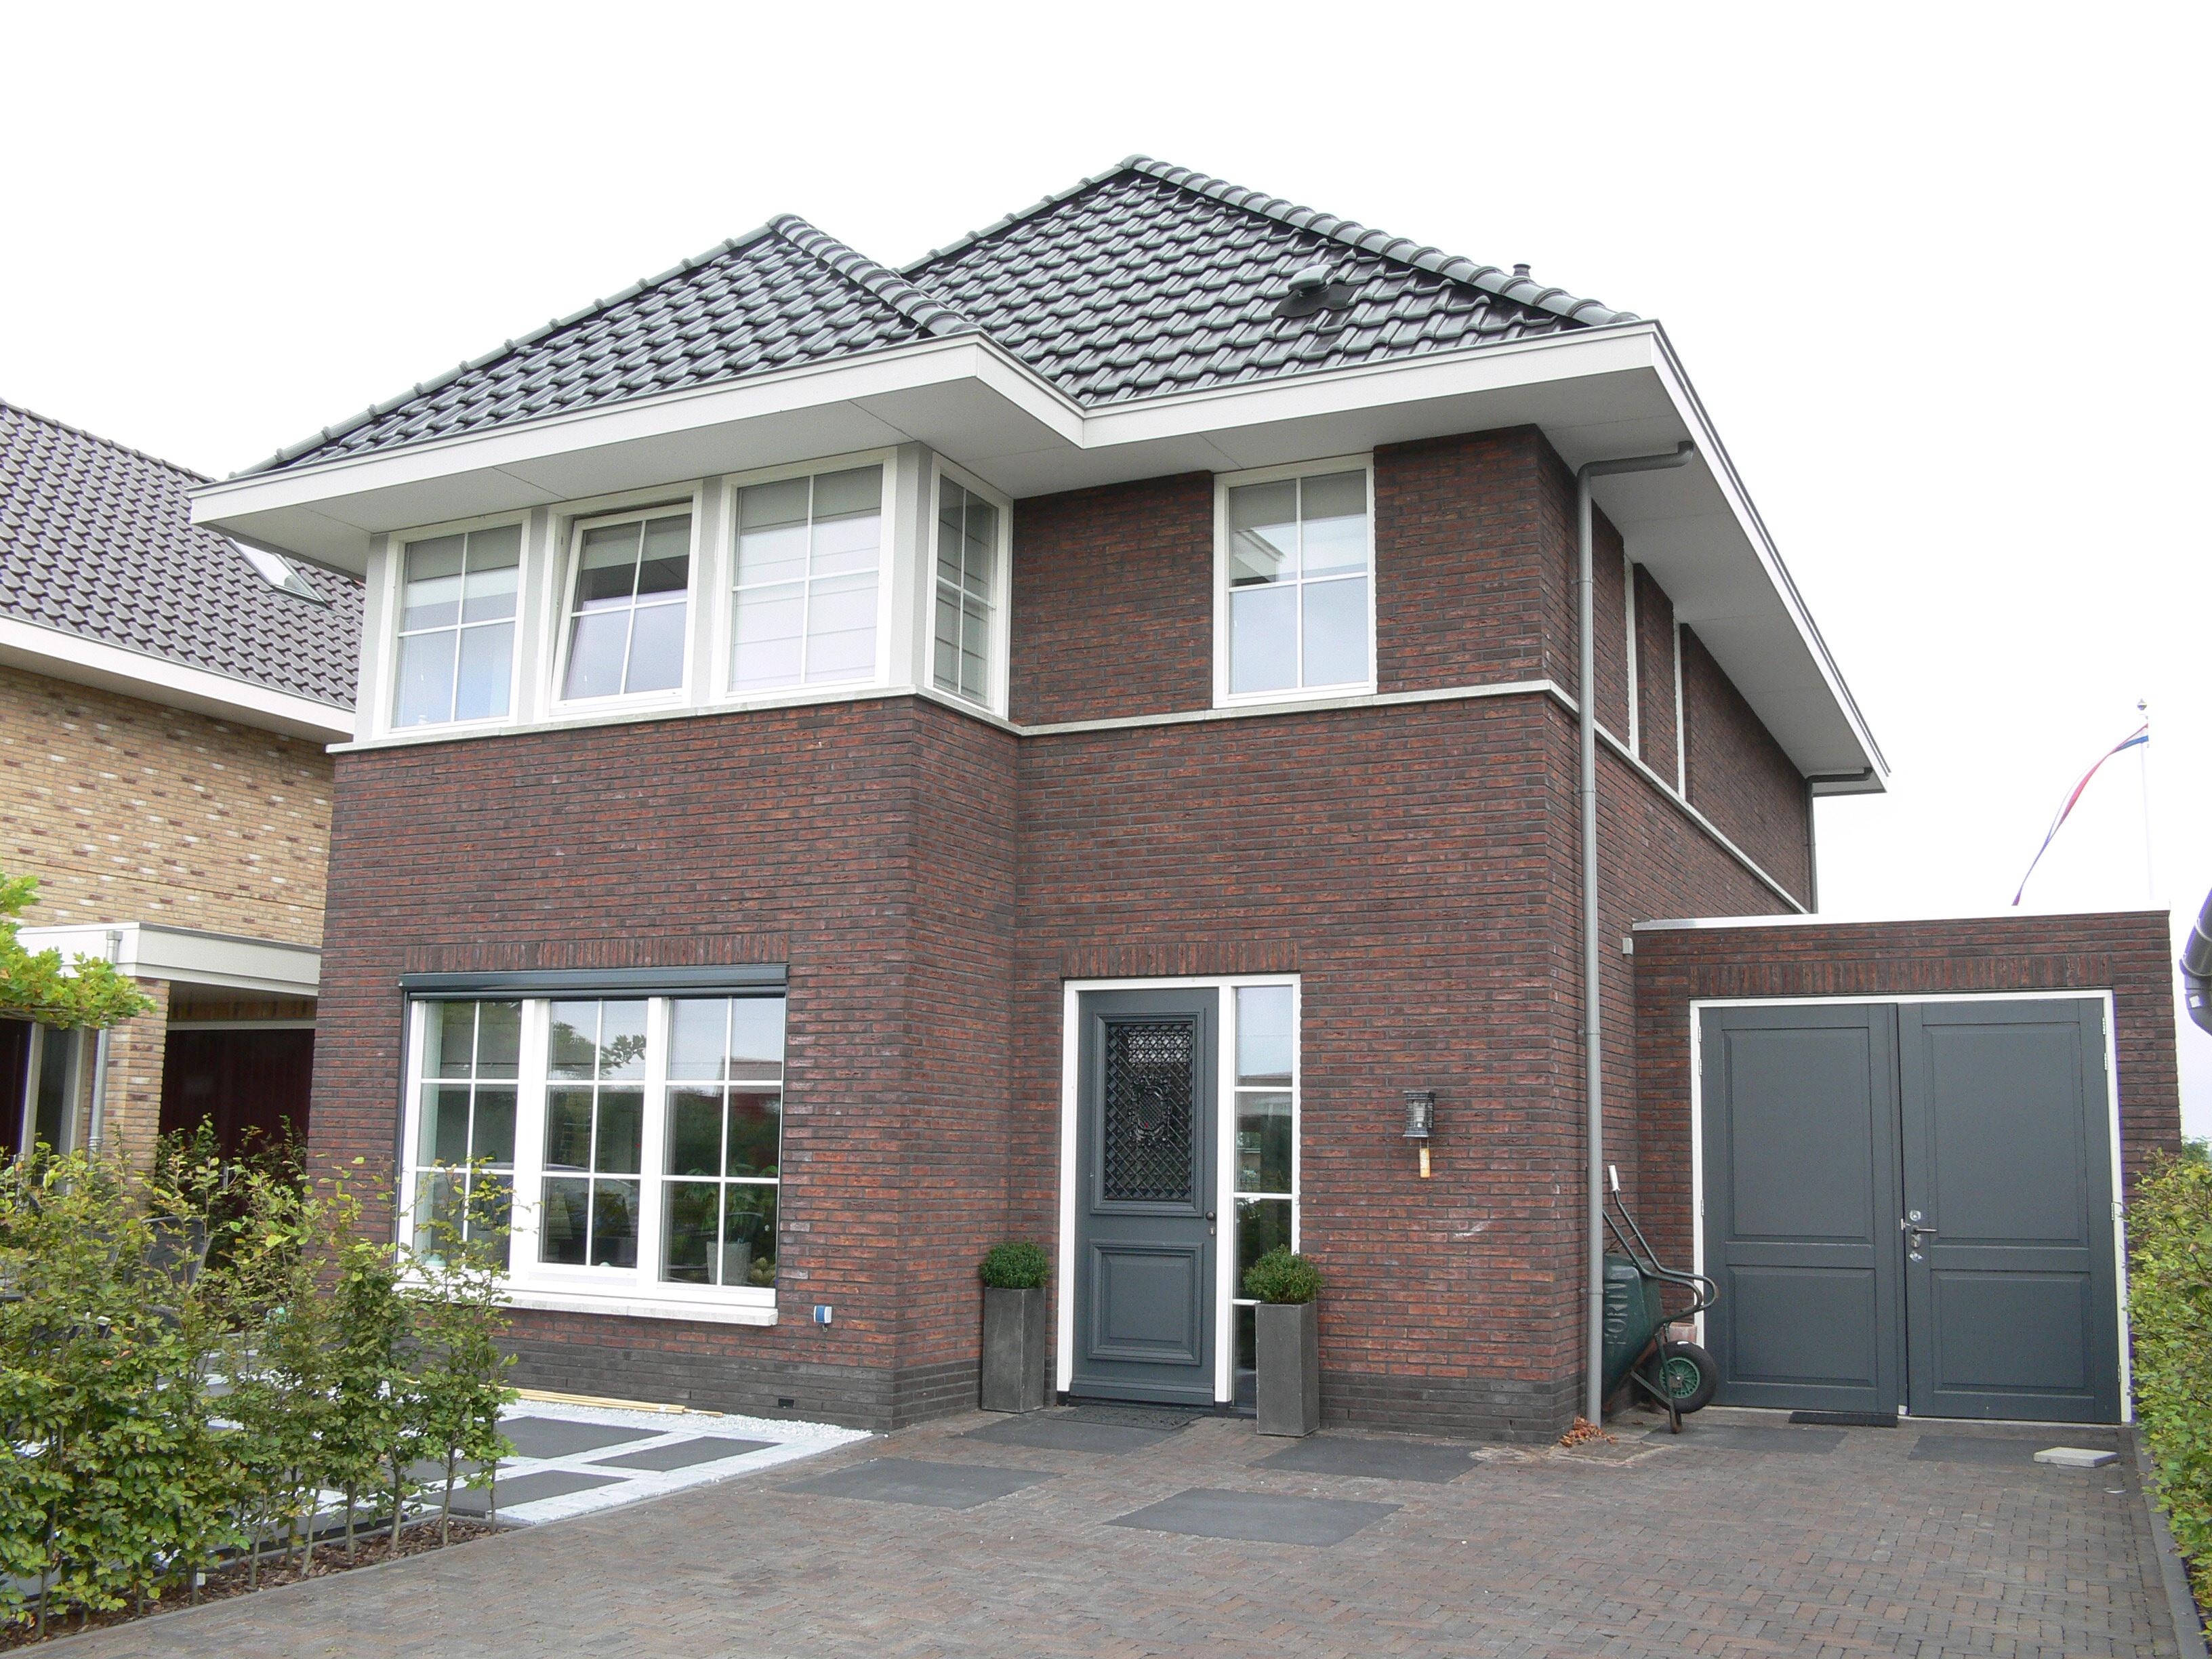 Woningtype in nieuwe wetering bouwbedrijf blauhuis for Nieuwe woning wensen